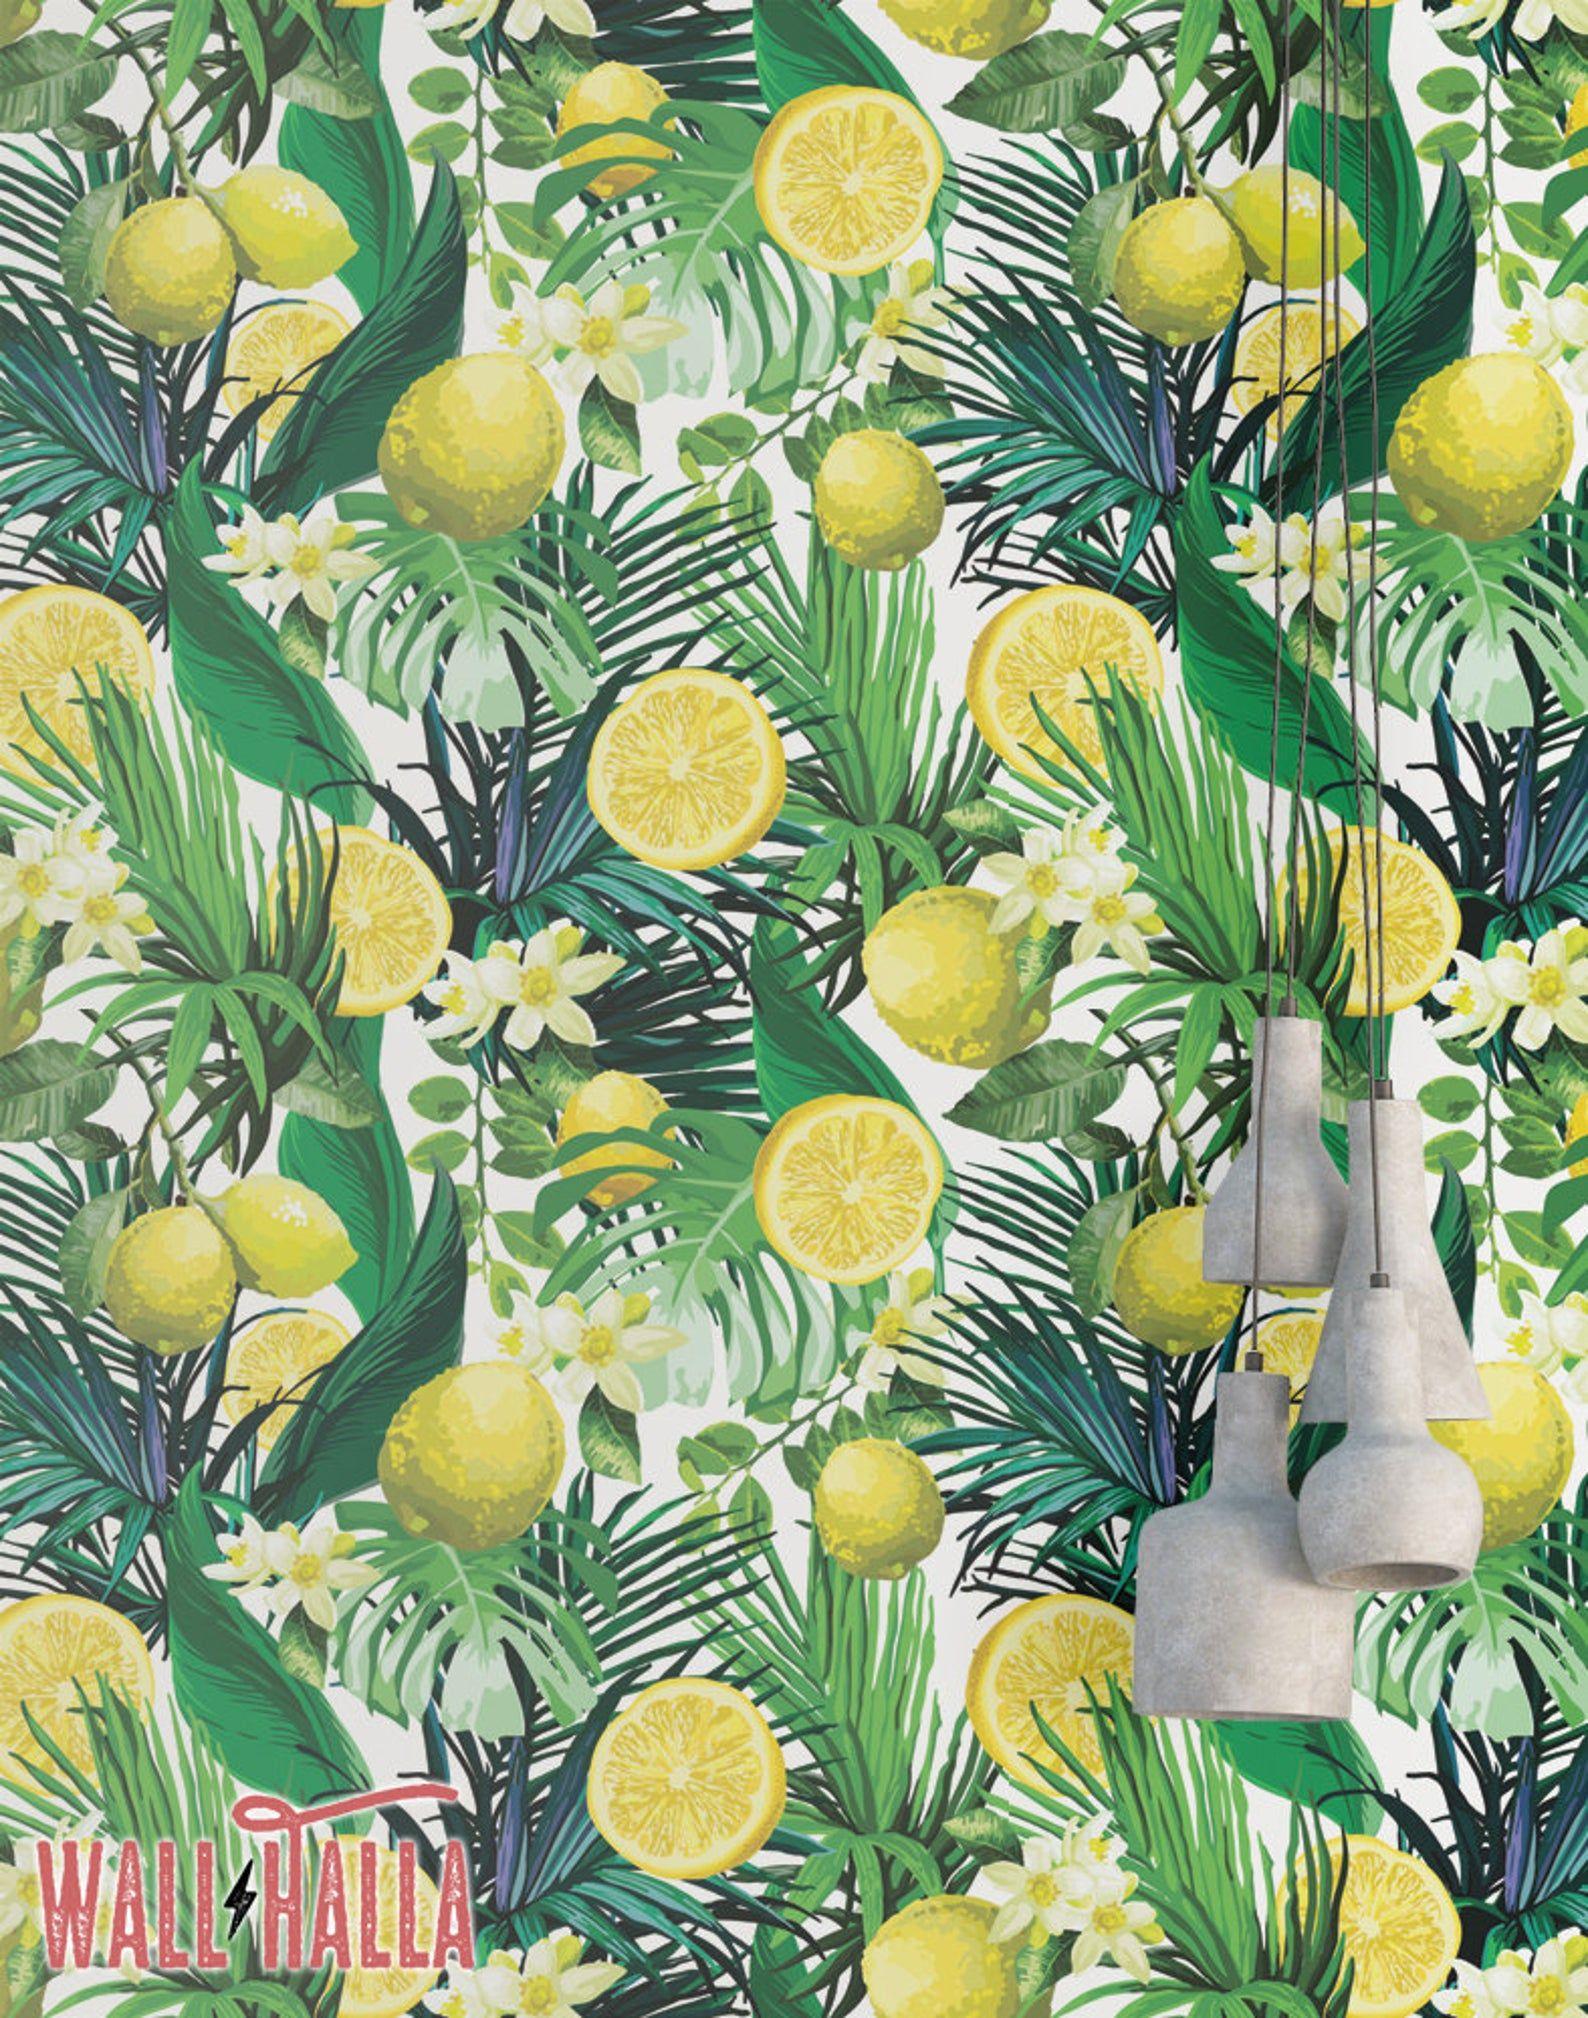 Lemon And Citris Blossom Wallpaper Removable Wallpaper Etsy Leaf Wallpaper Floral Wallpaper Wallpaper